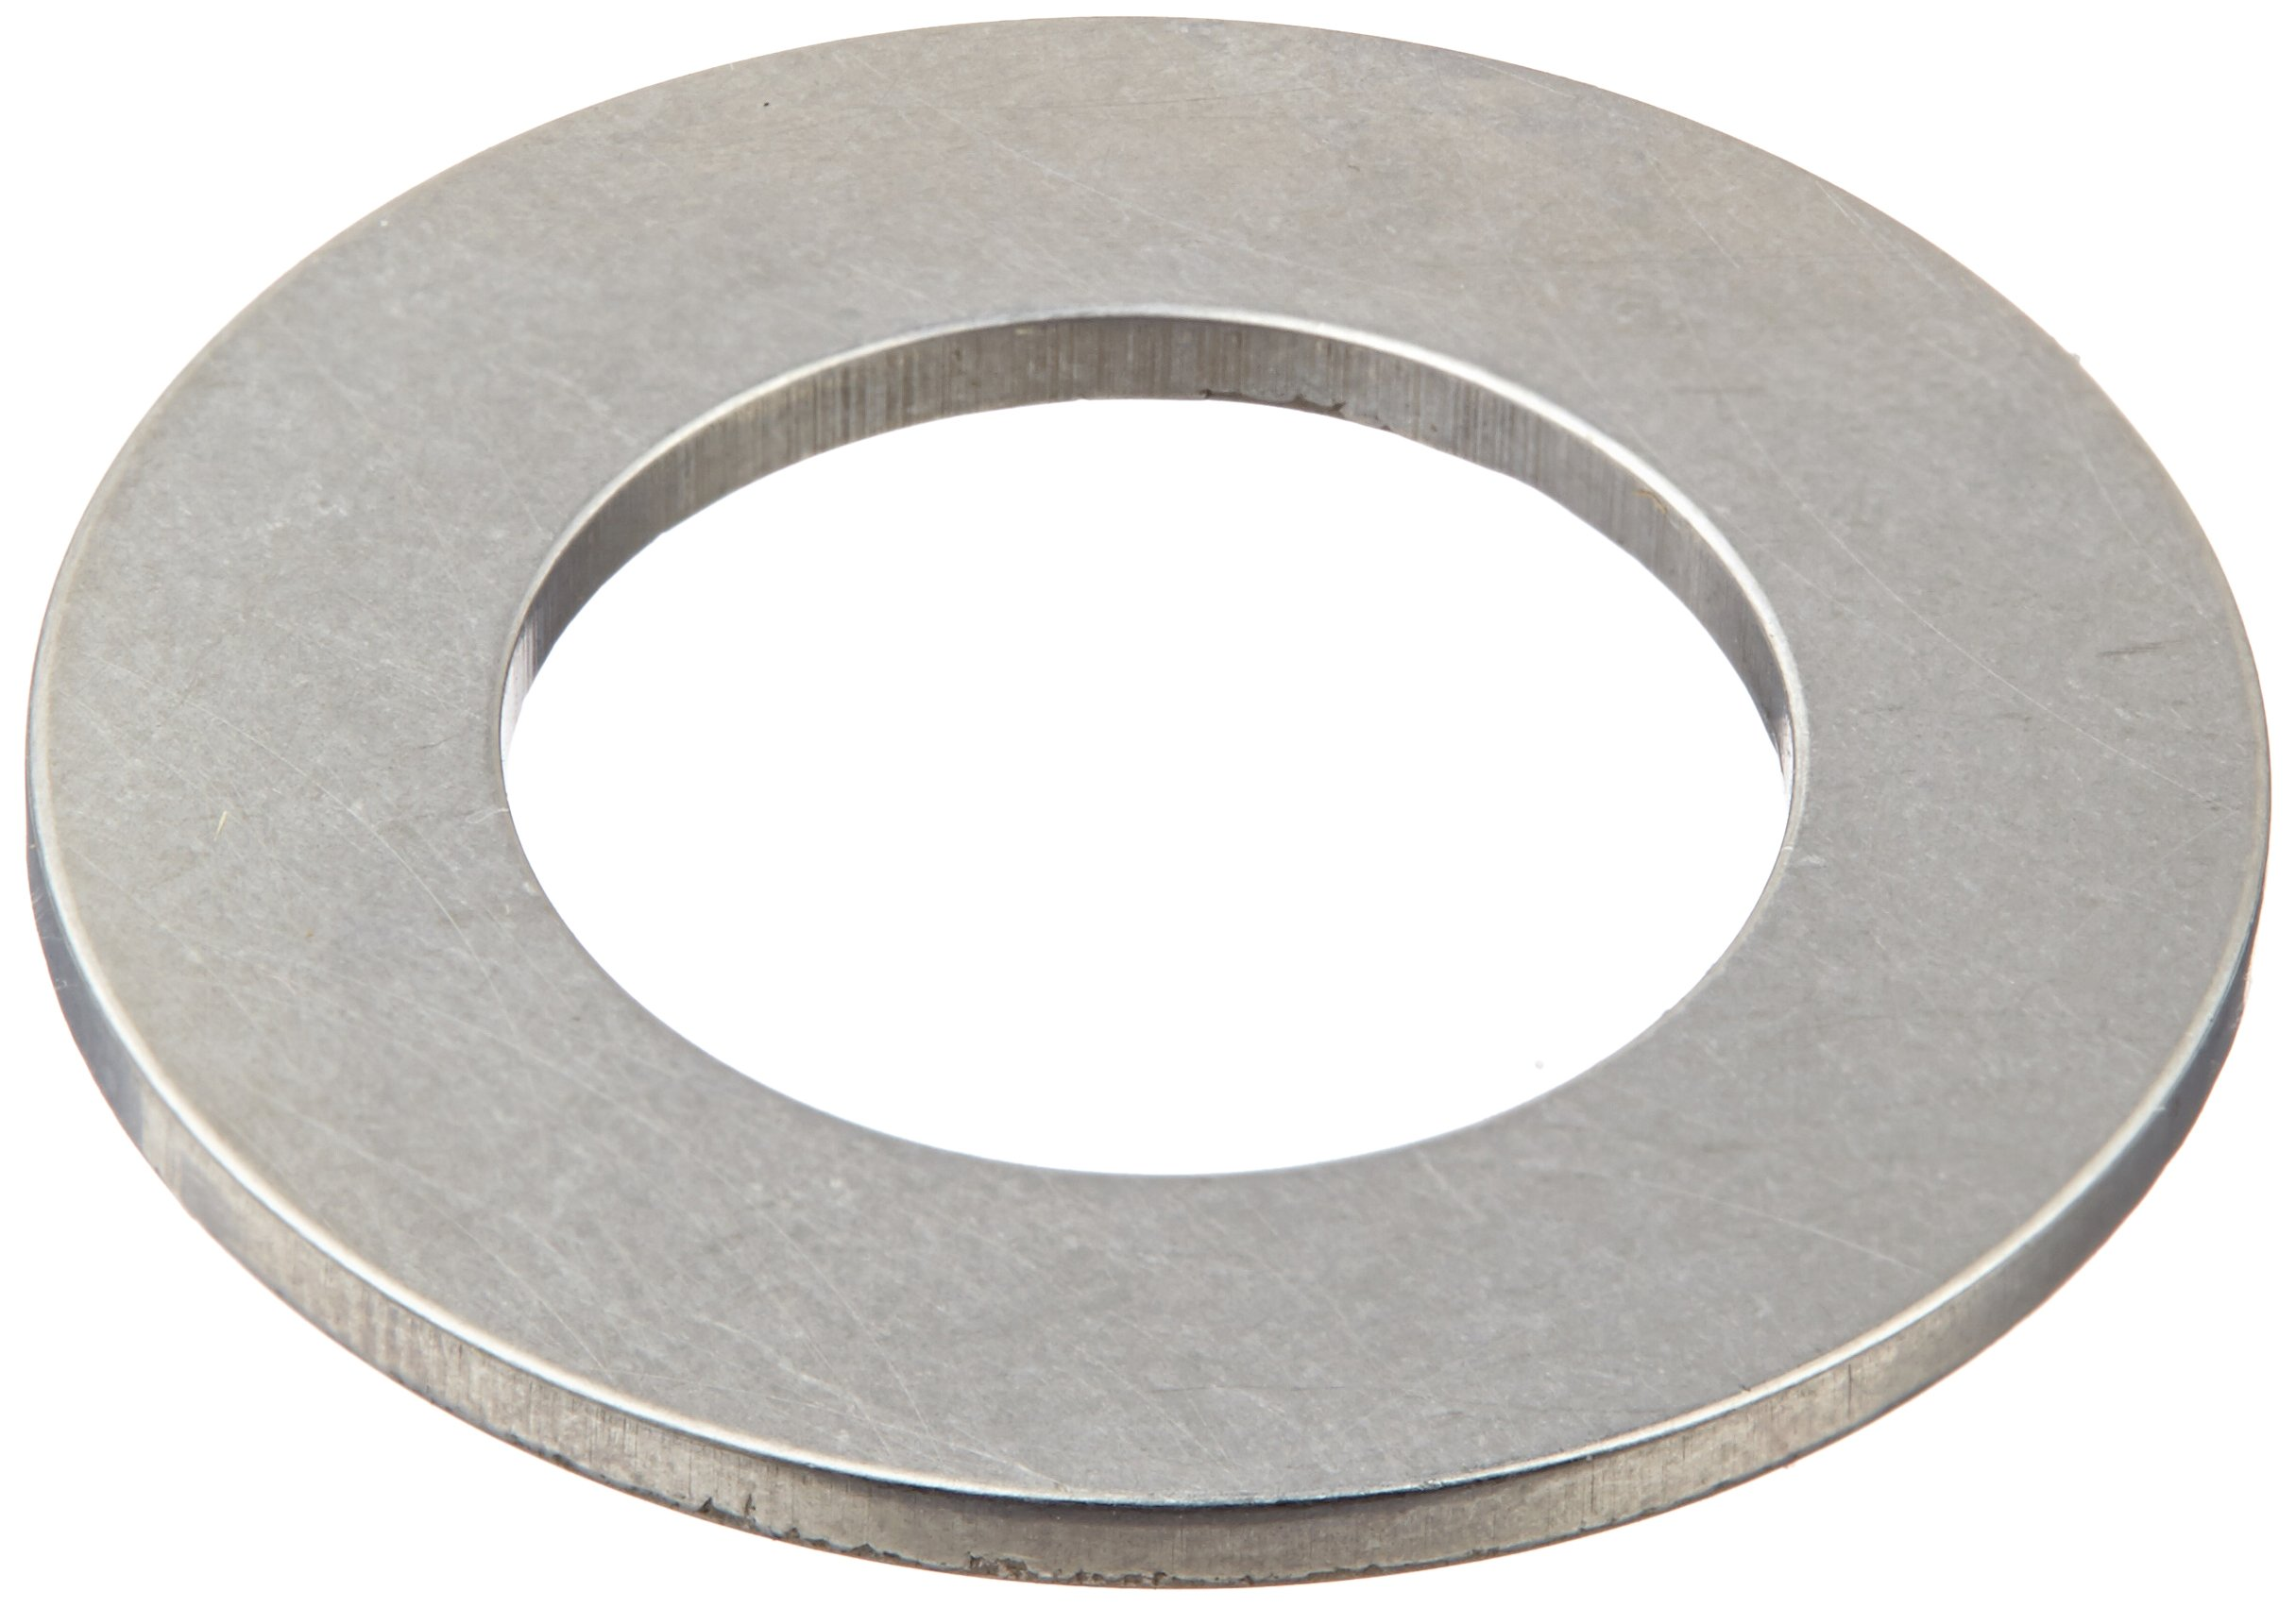 Koyo TRB-1018 Thrust Roller Bearing Washer, TR Type, Open, Inch, 5/8'' ID, 1-1/8'' OD, 1/16'' Width